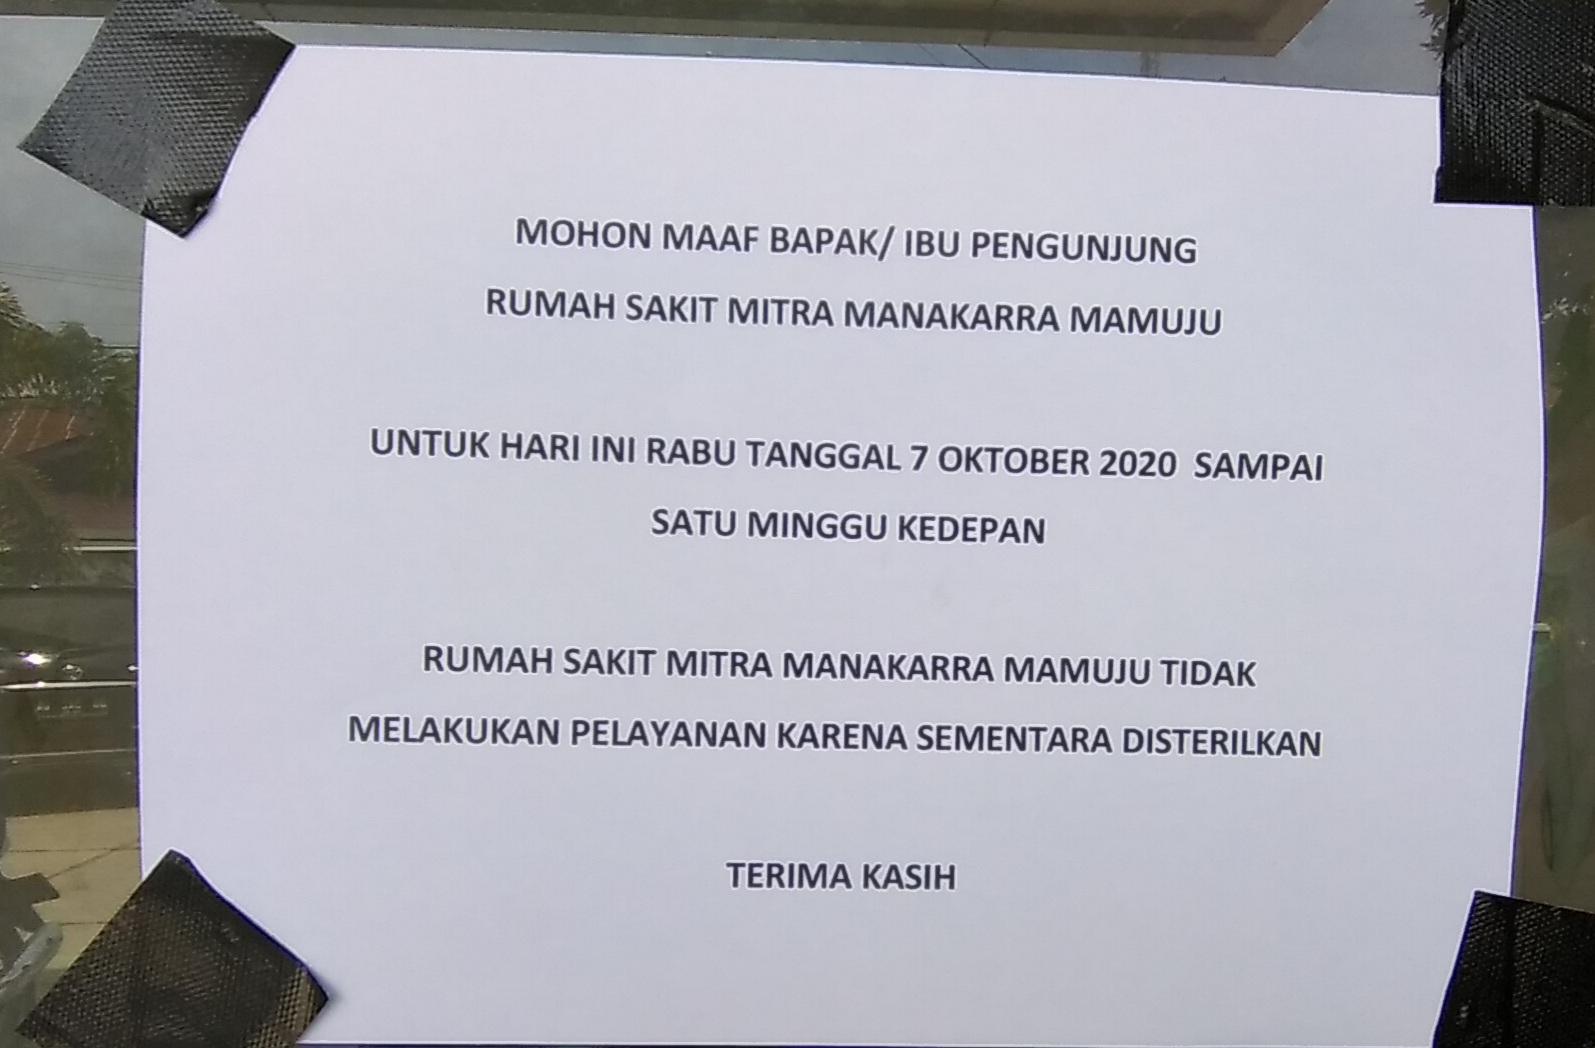 RS Mitra Manakarra Disterilkan Selama Sepekan